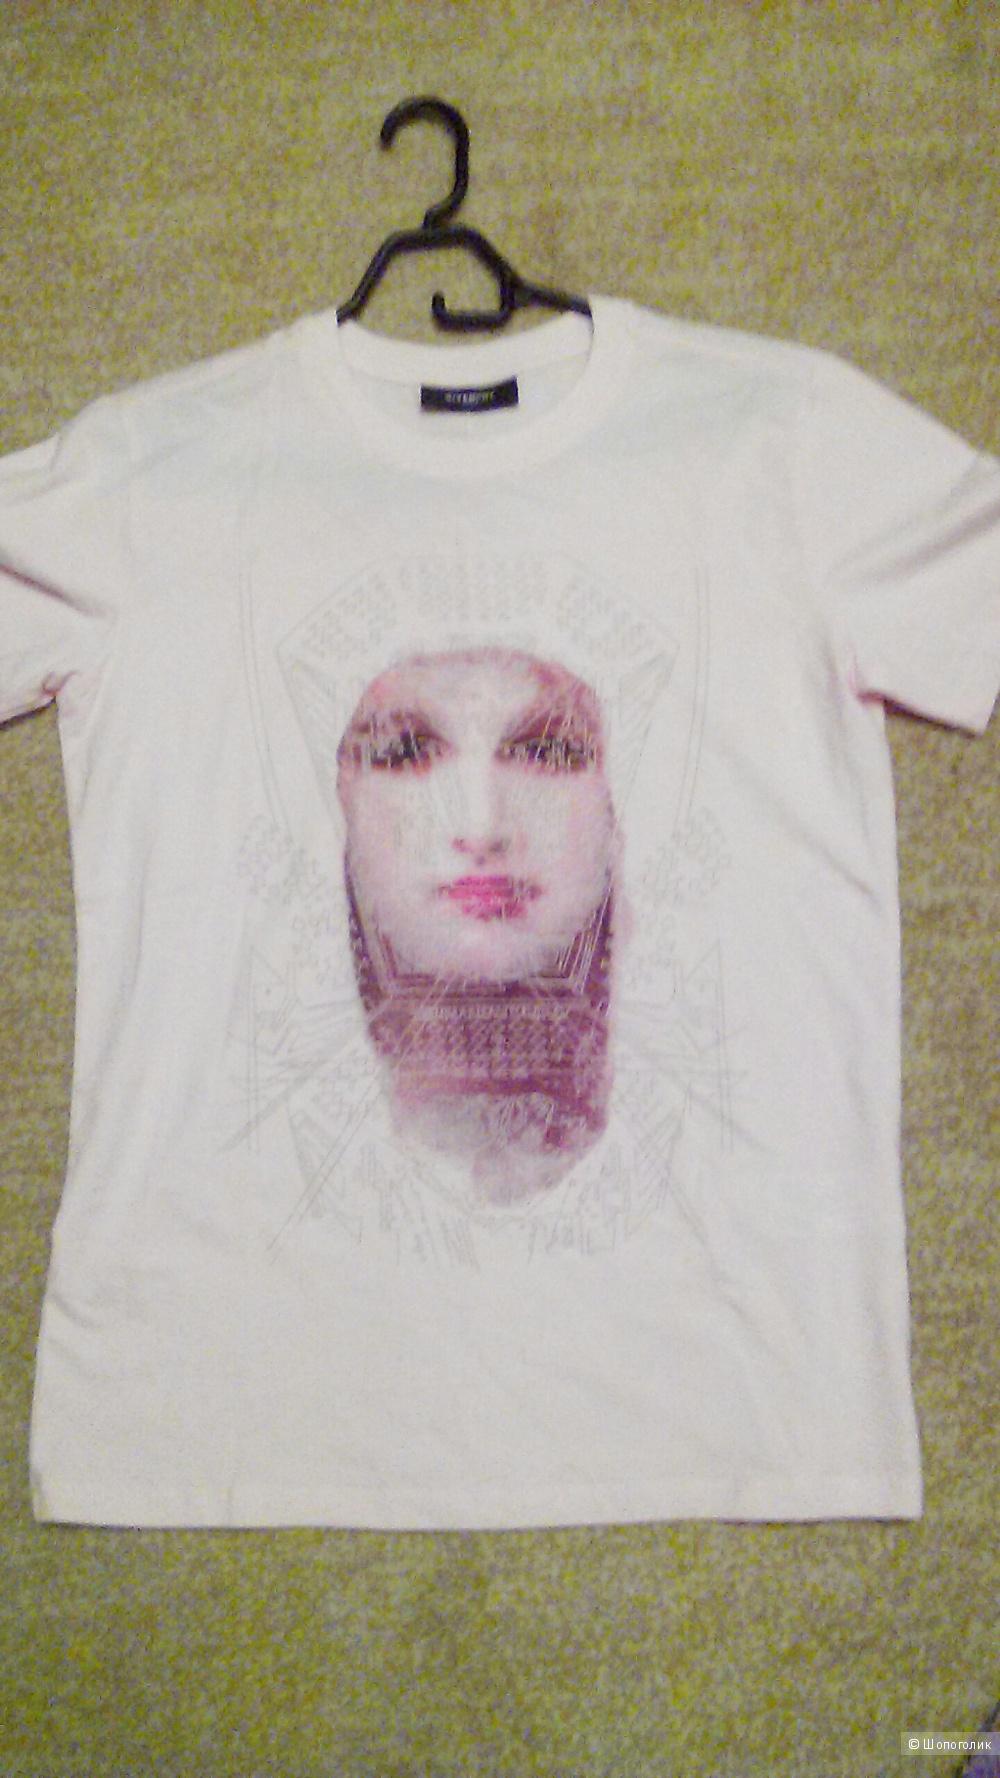 Футболка   Givenchy  ,  размер  М.